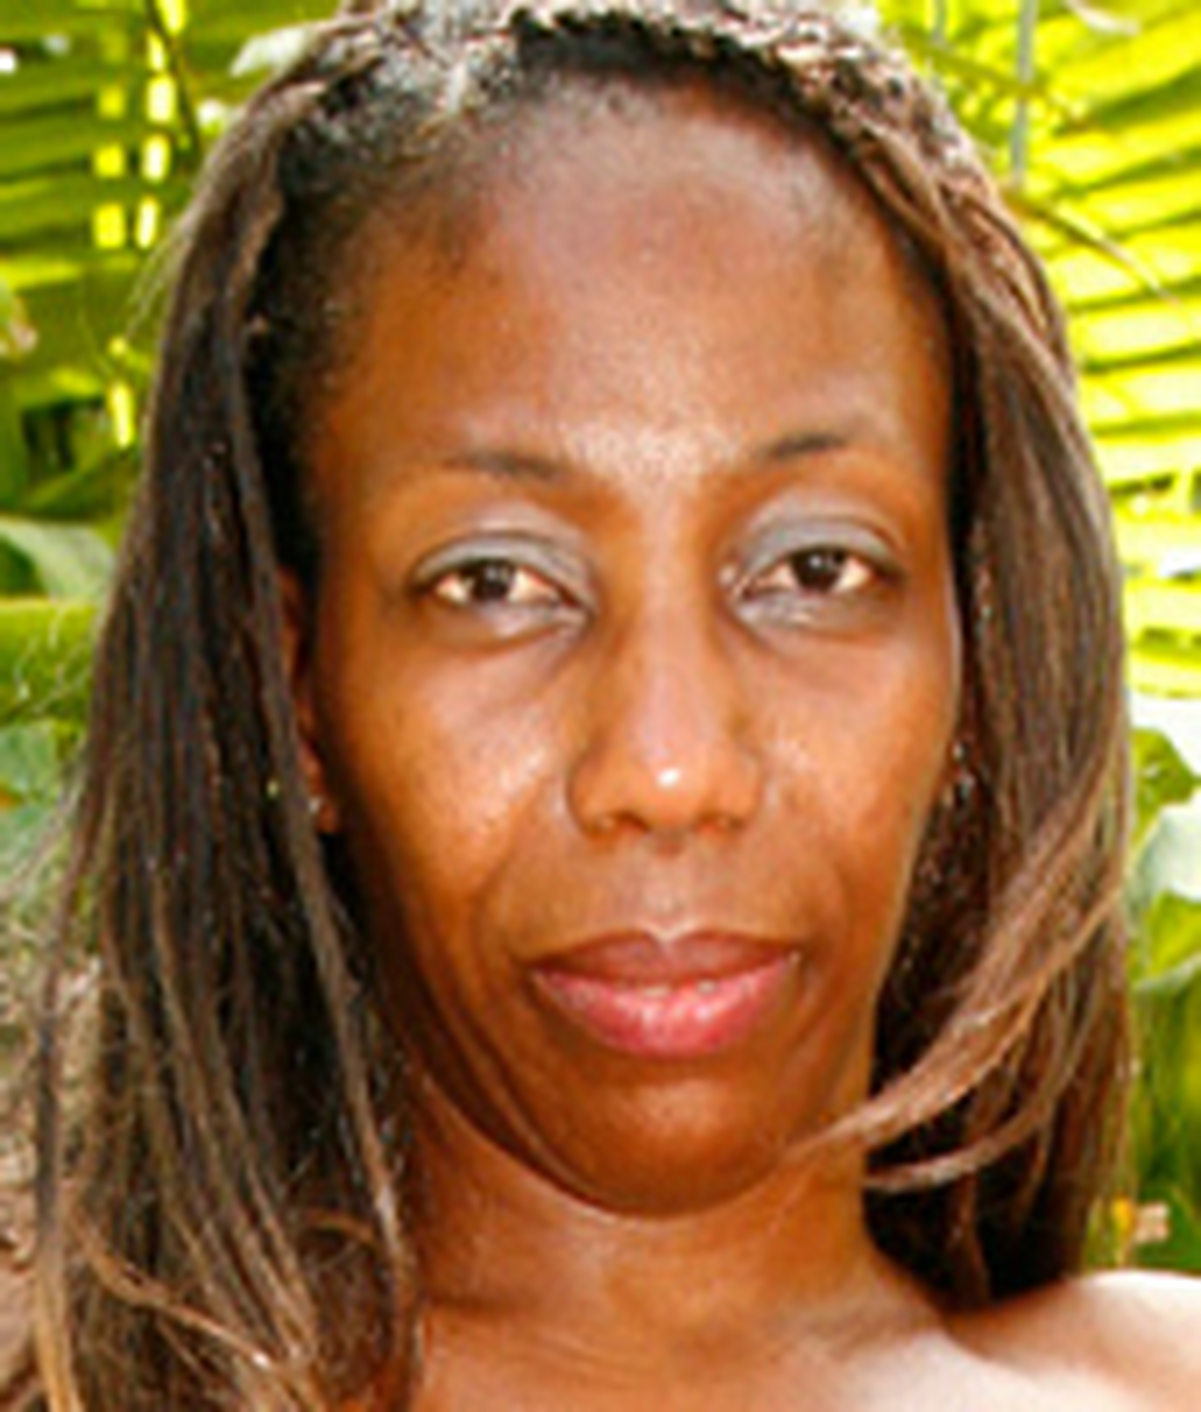 Ms. Satin